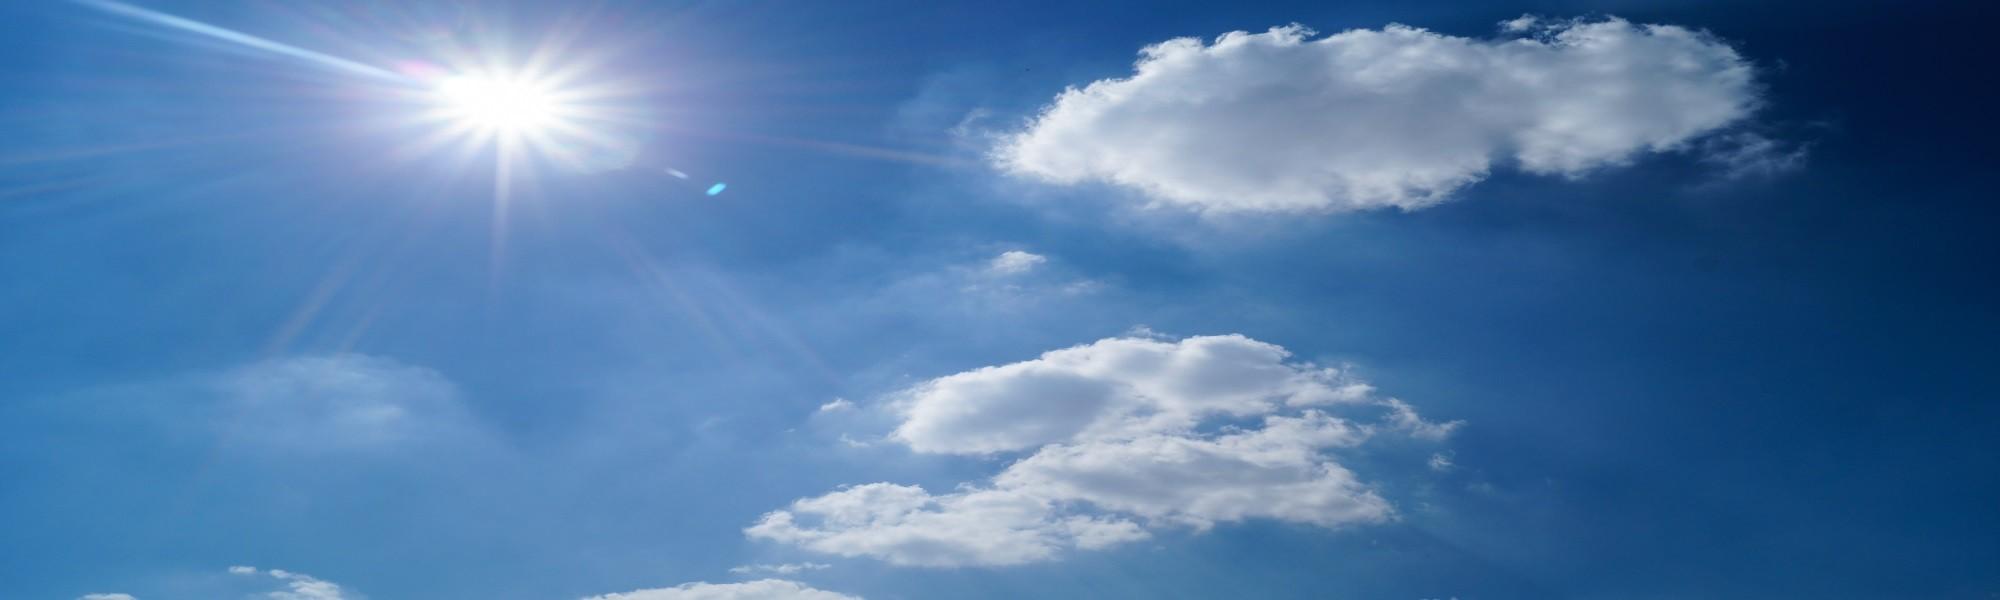 sunny_day_free_license_cc0.jpg